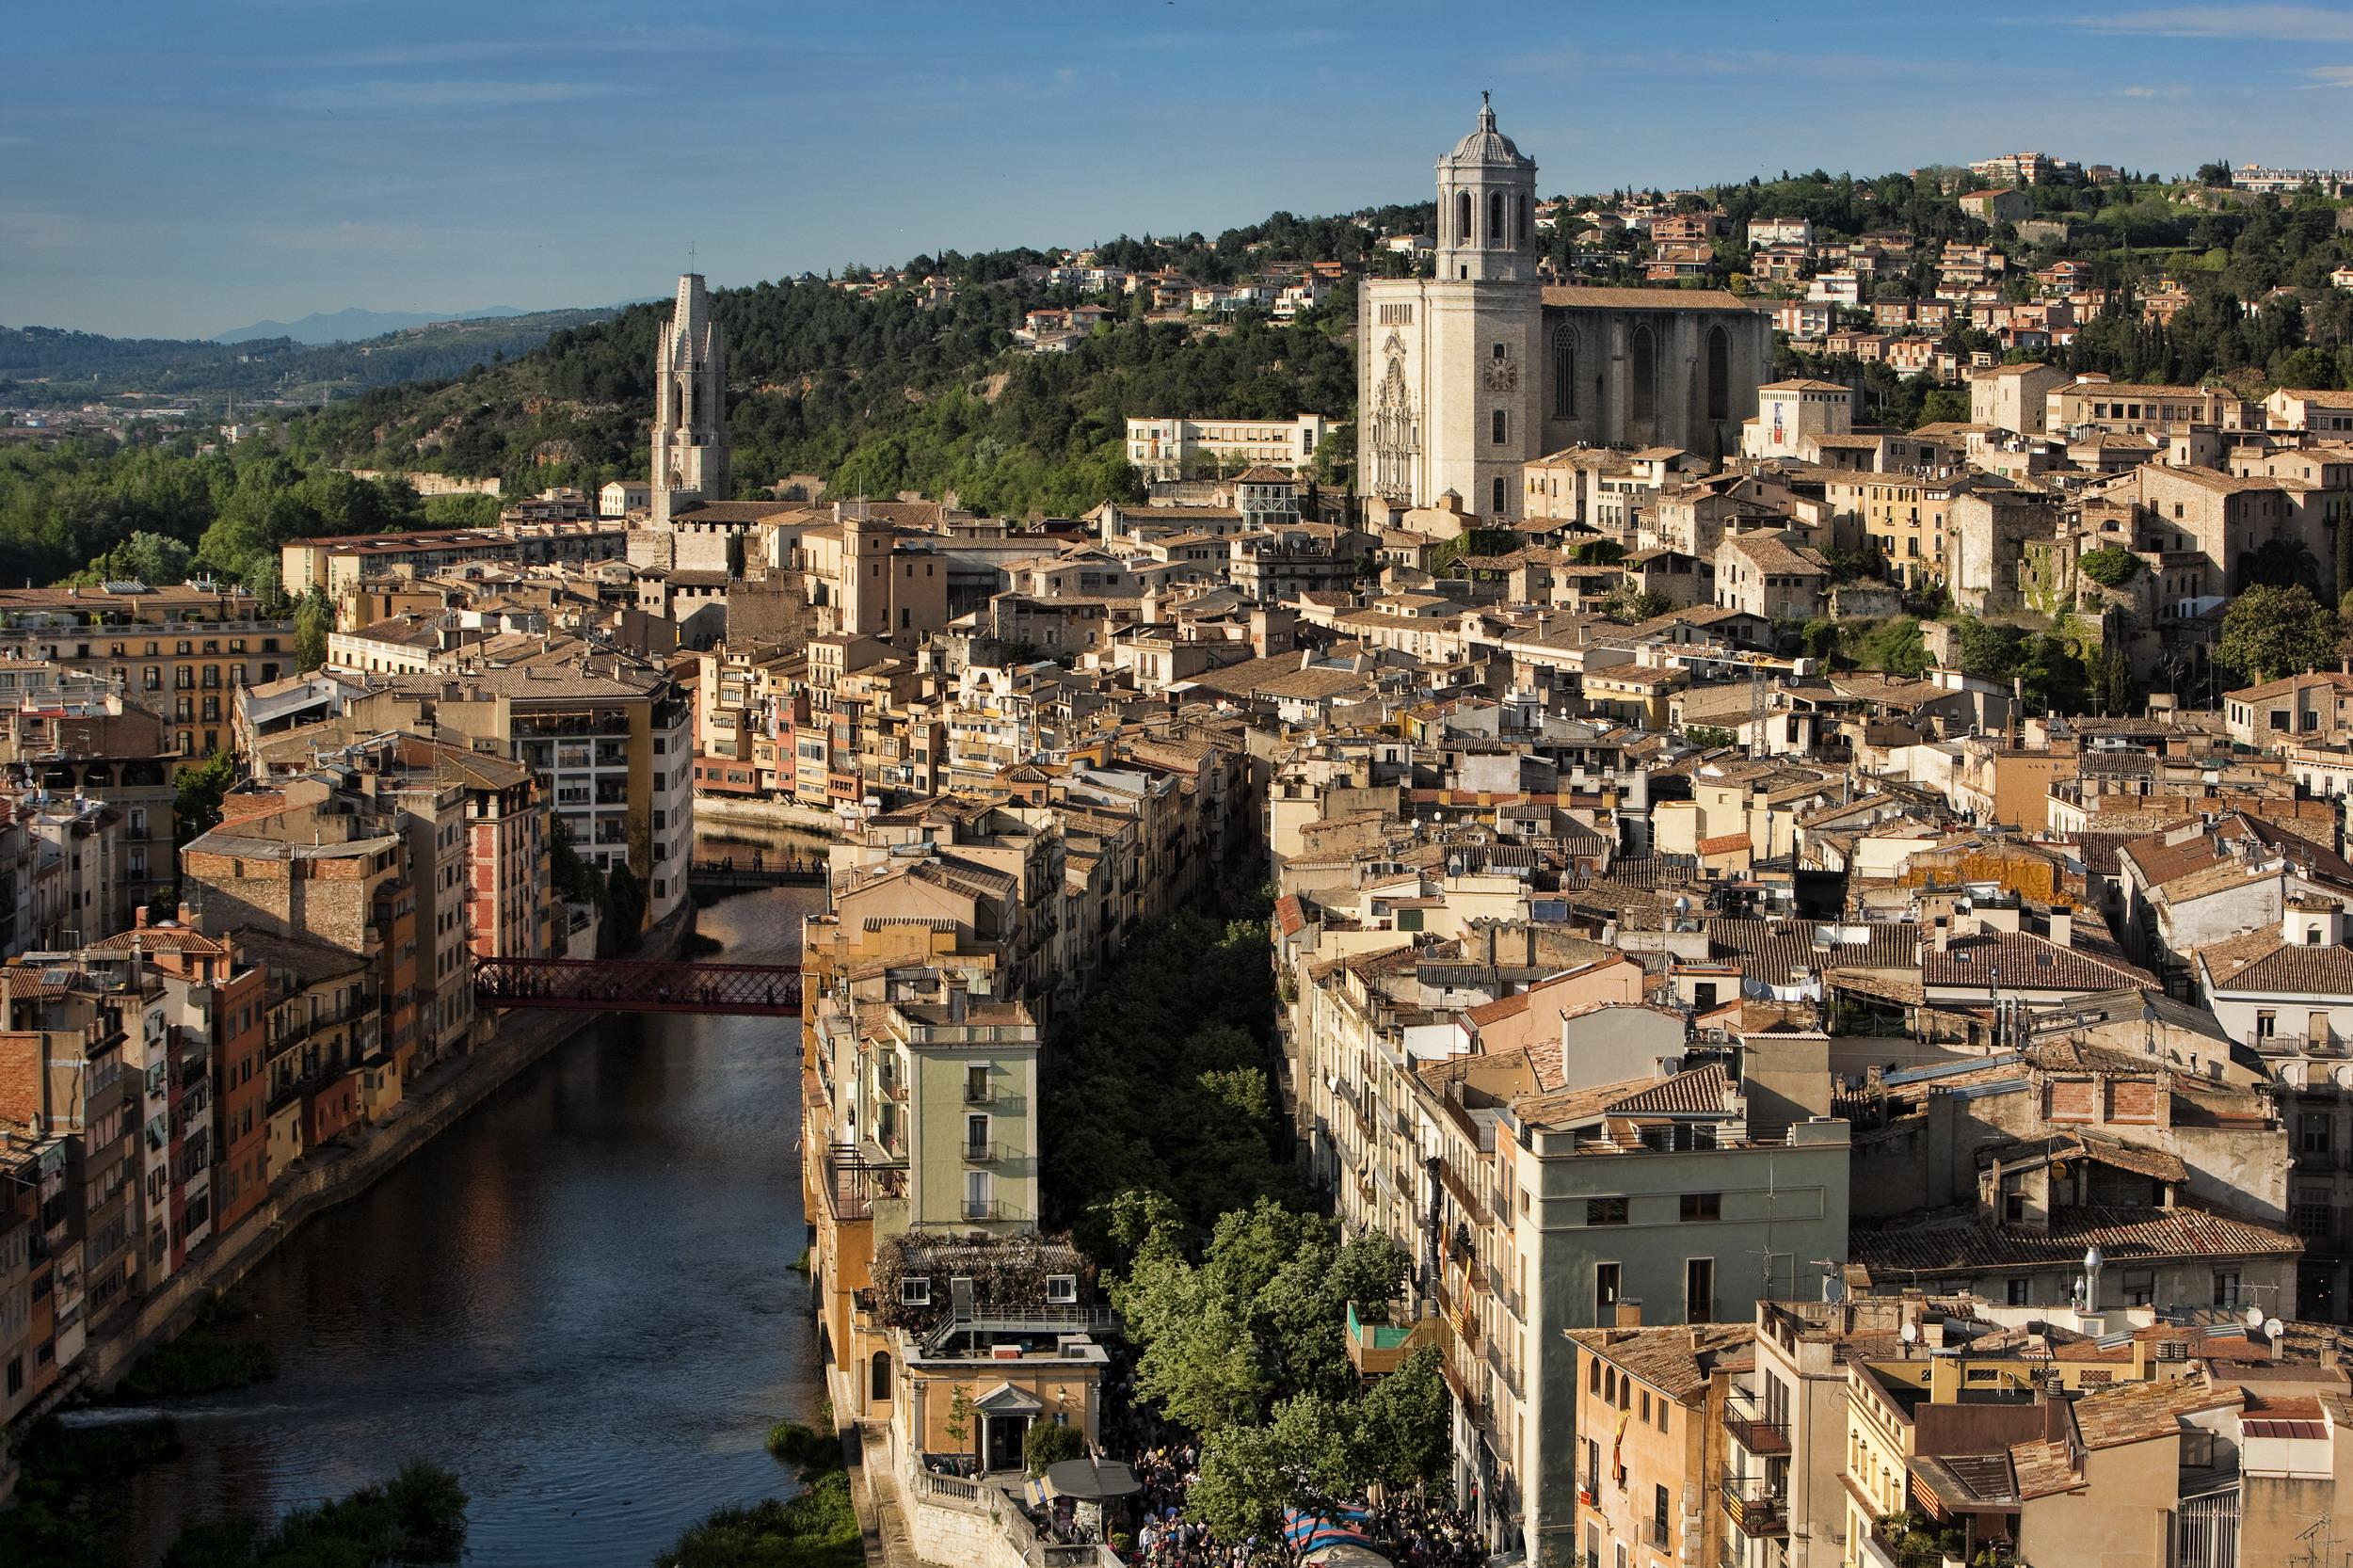 File:Girona des de l aire.jpg - Wikimedia Commons